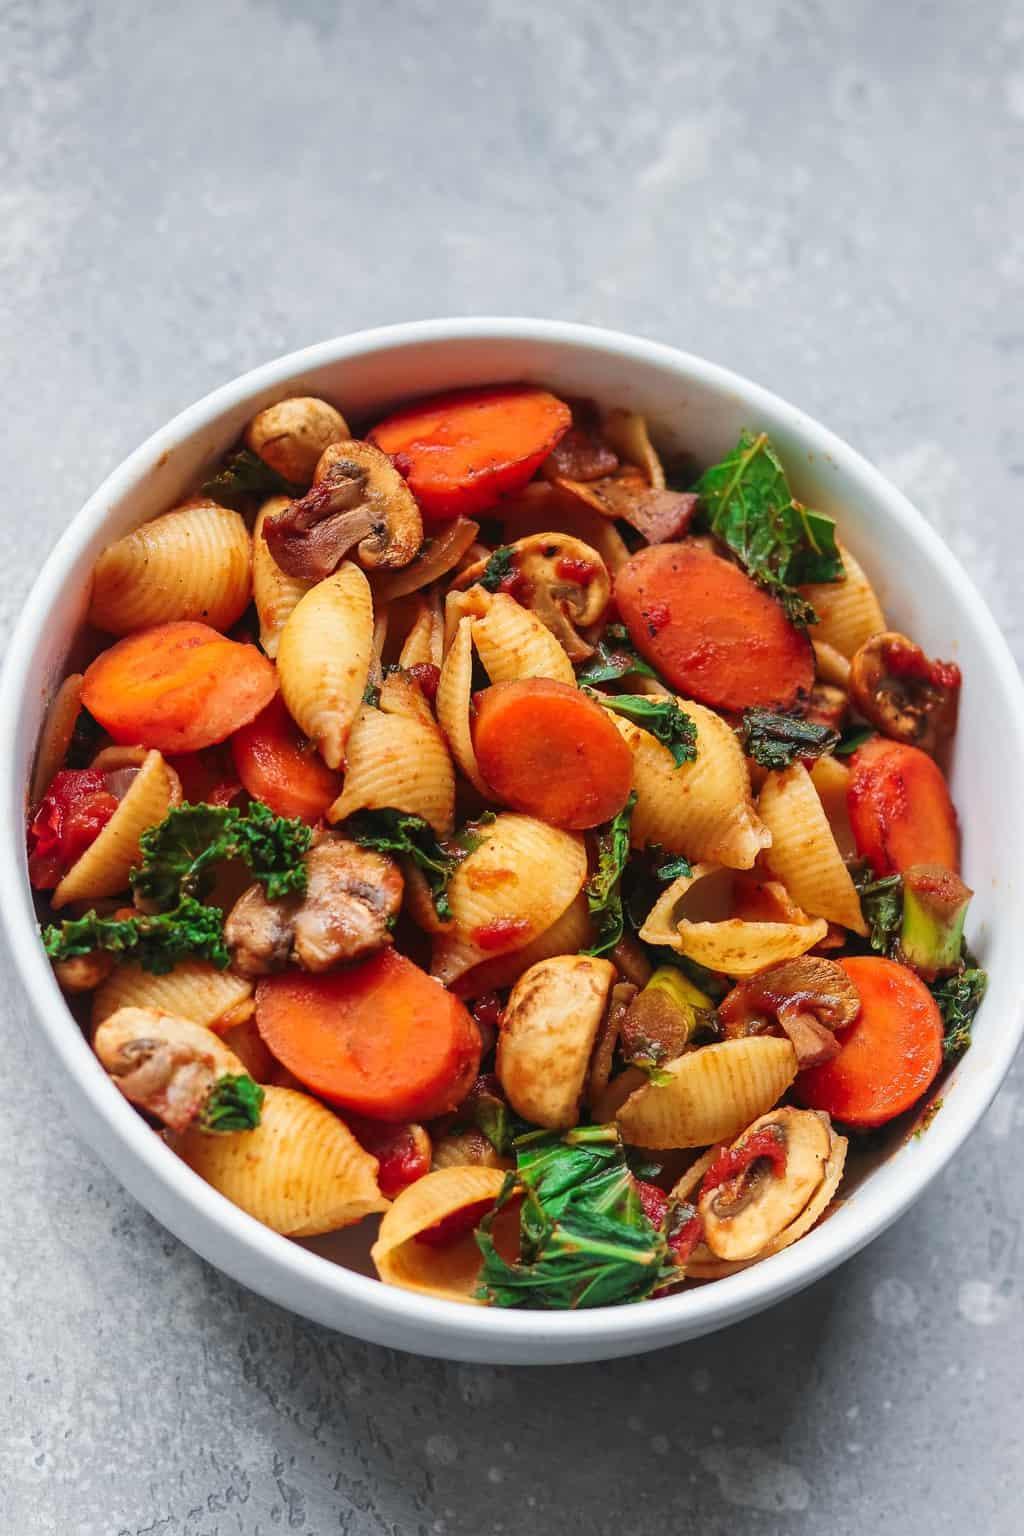 Vegan vegetable pasta with mushrooms